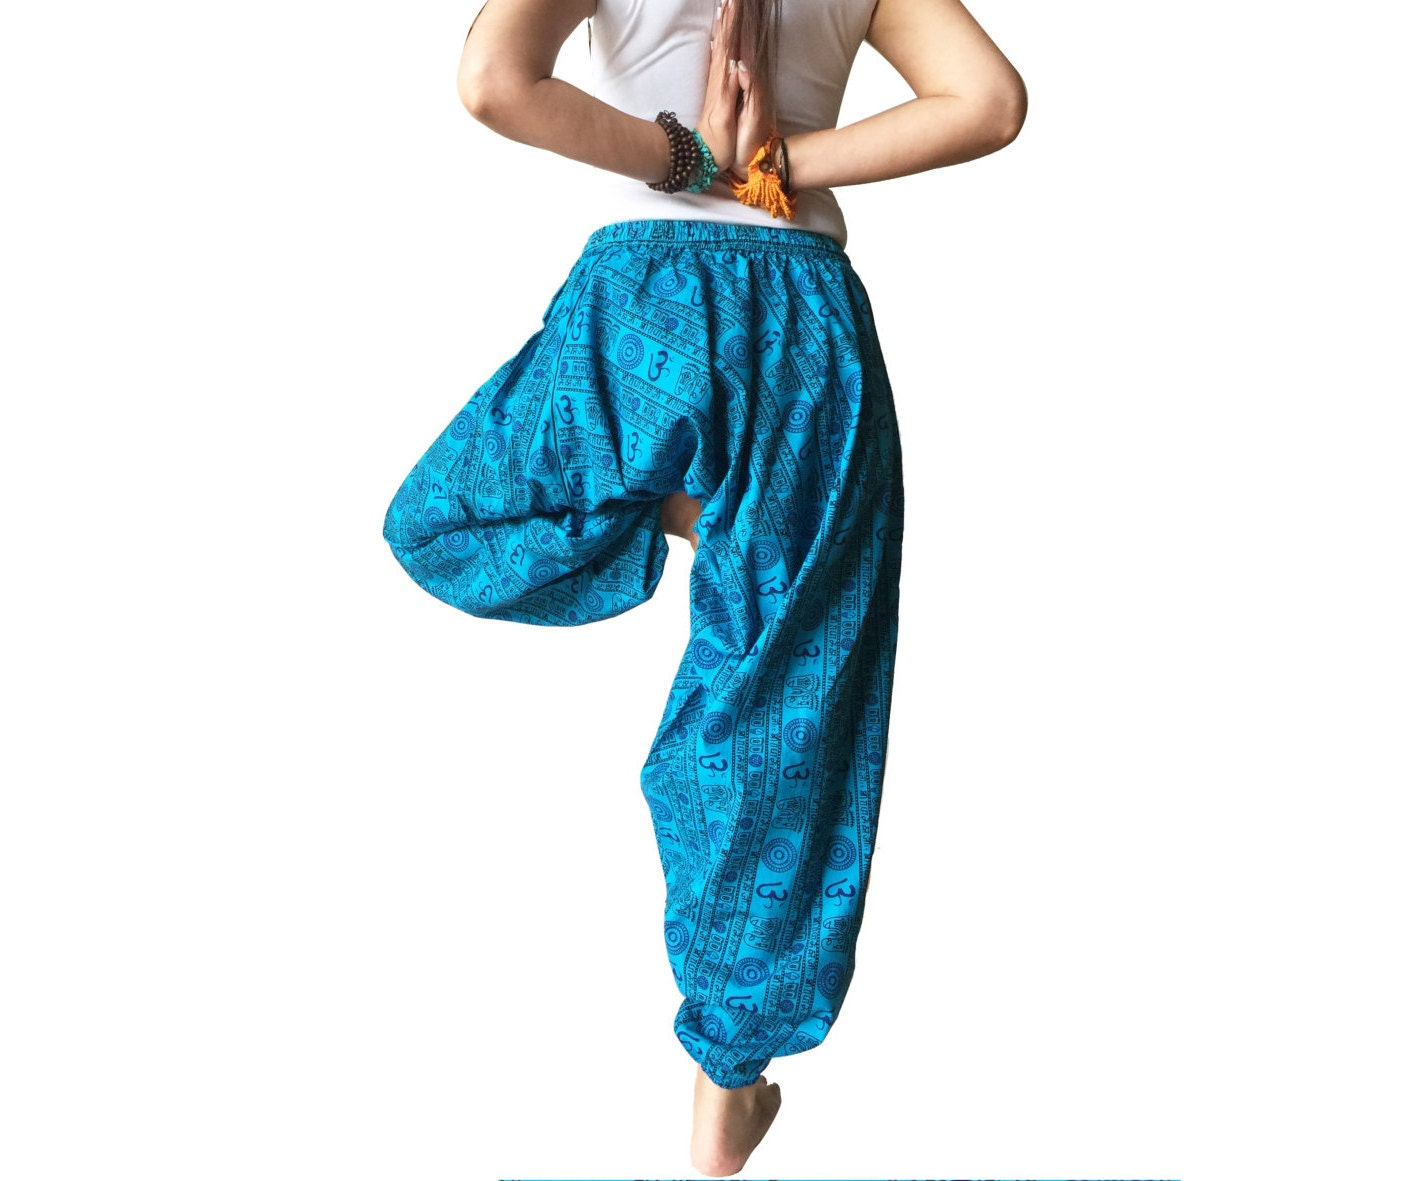 AUM OM Print Cotton Fabric Yoga Pants Blue Baggy By AGORAA